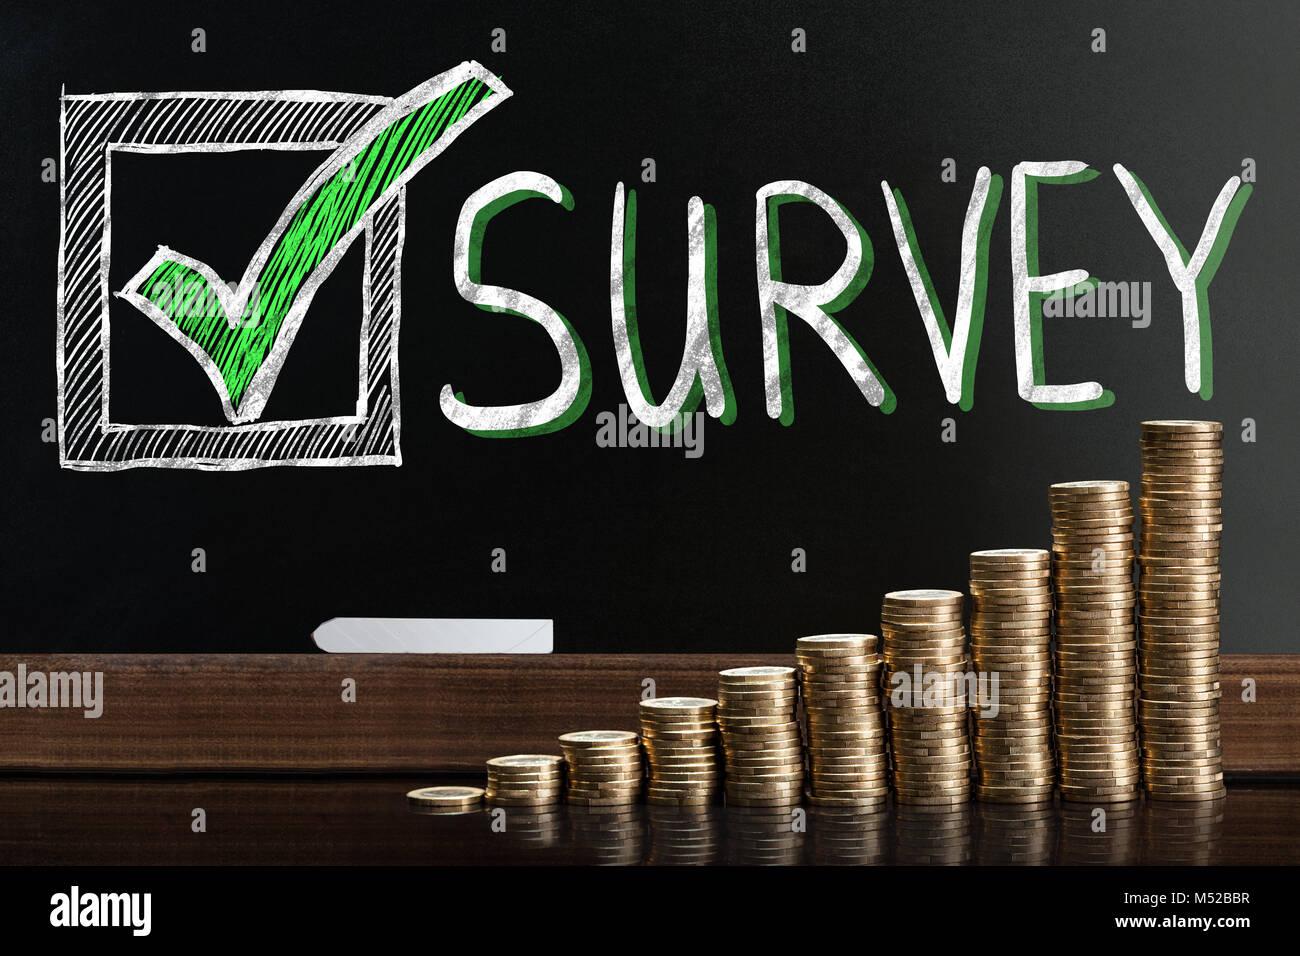 Customer Satisfaction Survey On Blackboard Behind Stacked Coins - Stock Image